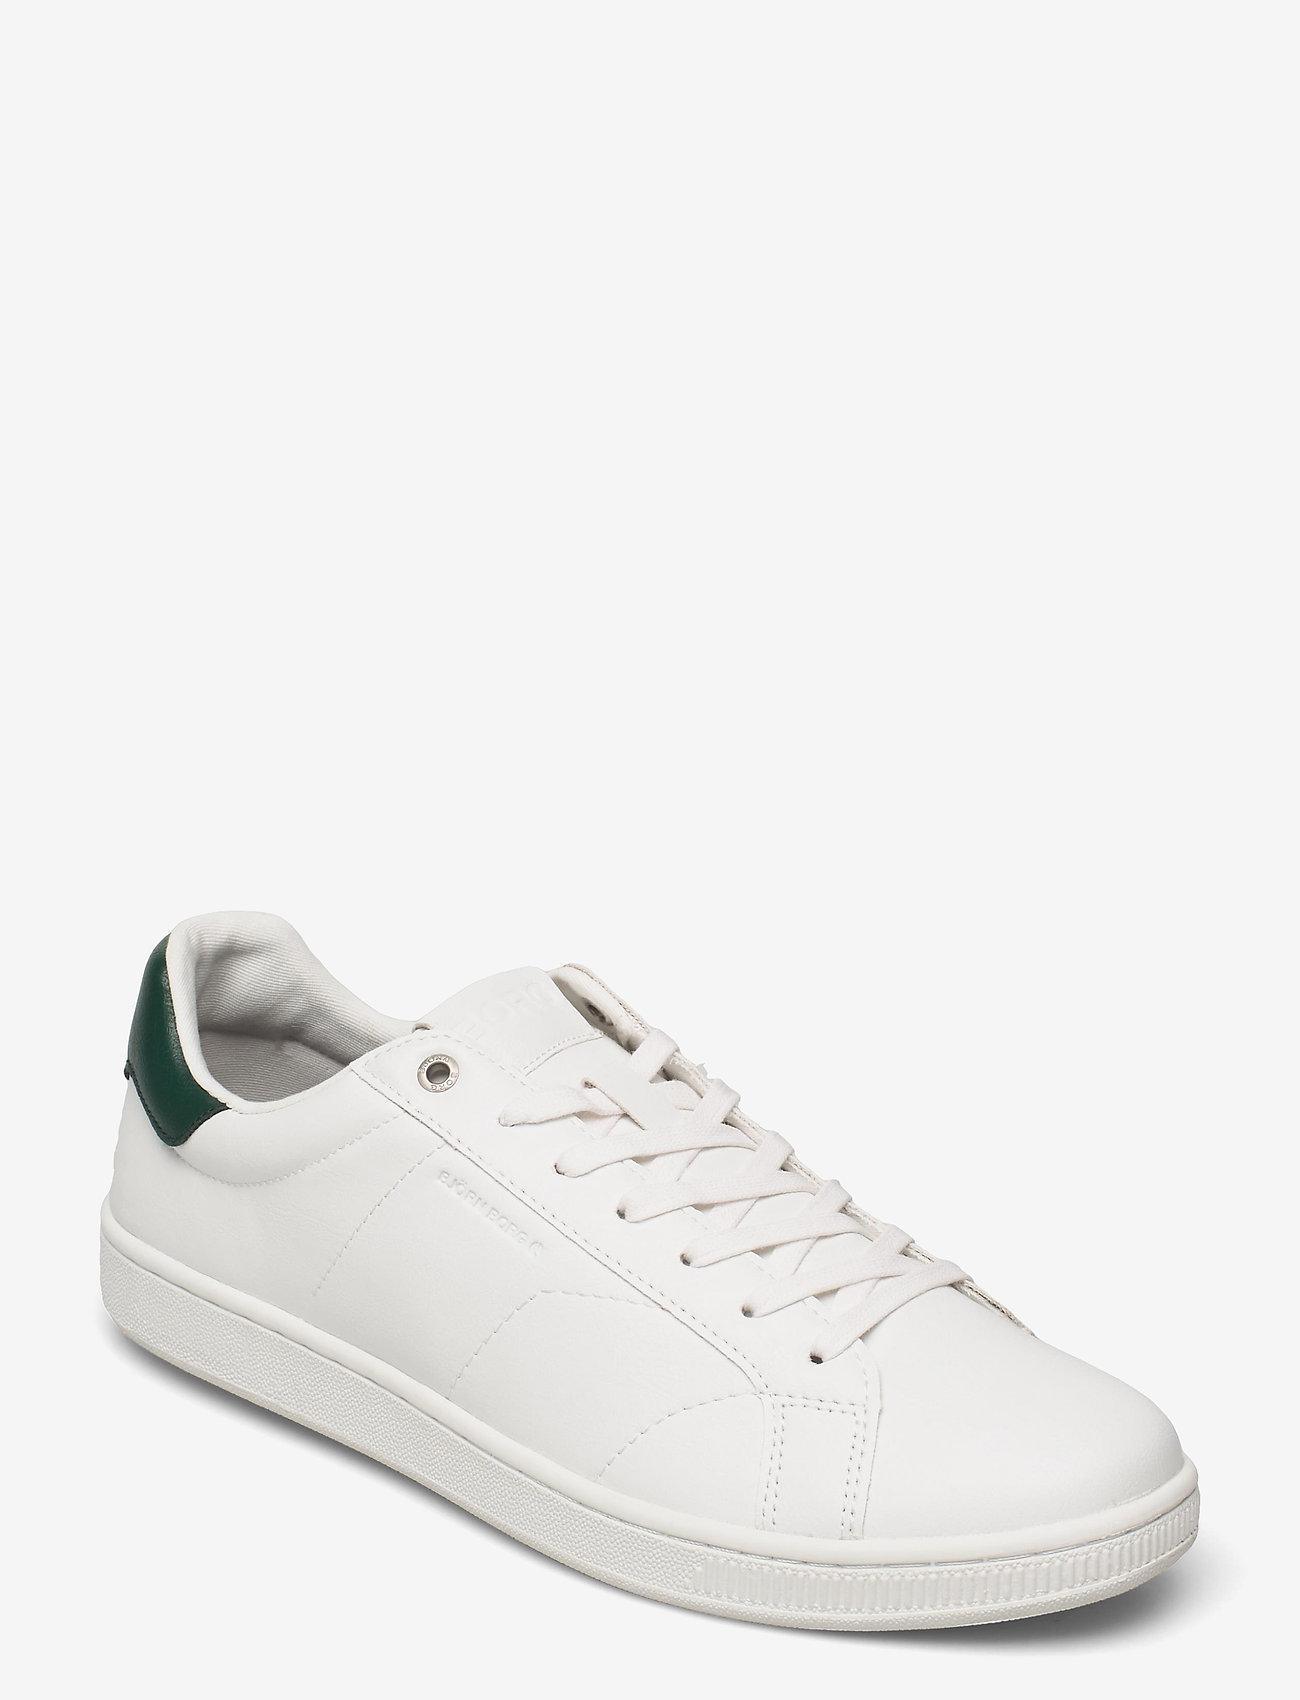 Björn Borg - T305 CLS BTM M - laag sneakers - white/green - 0